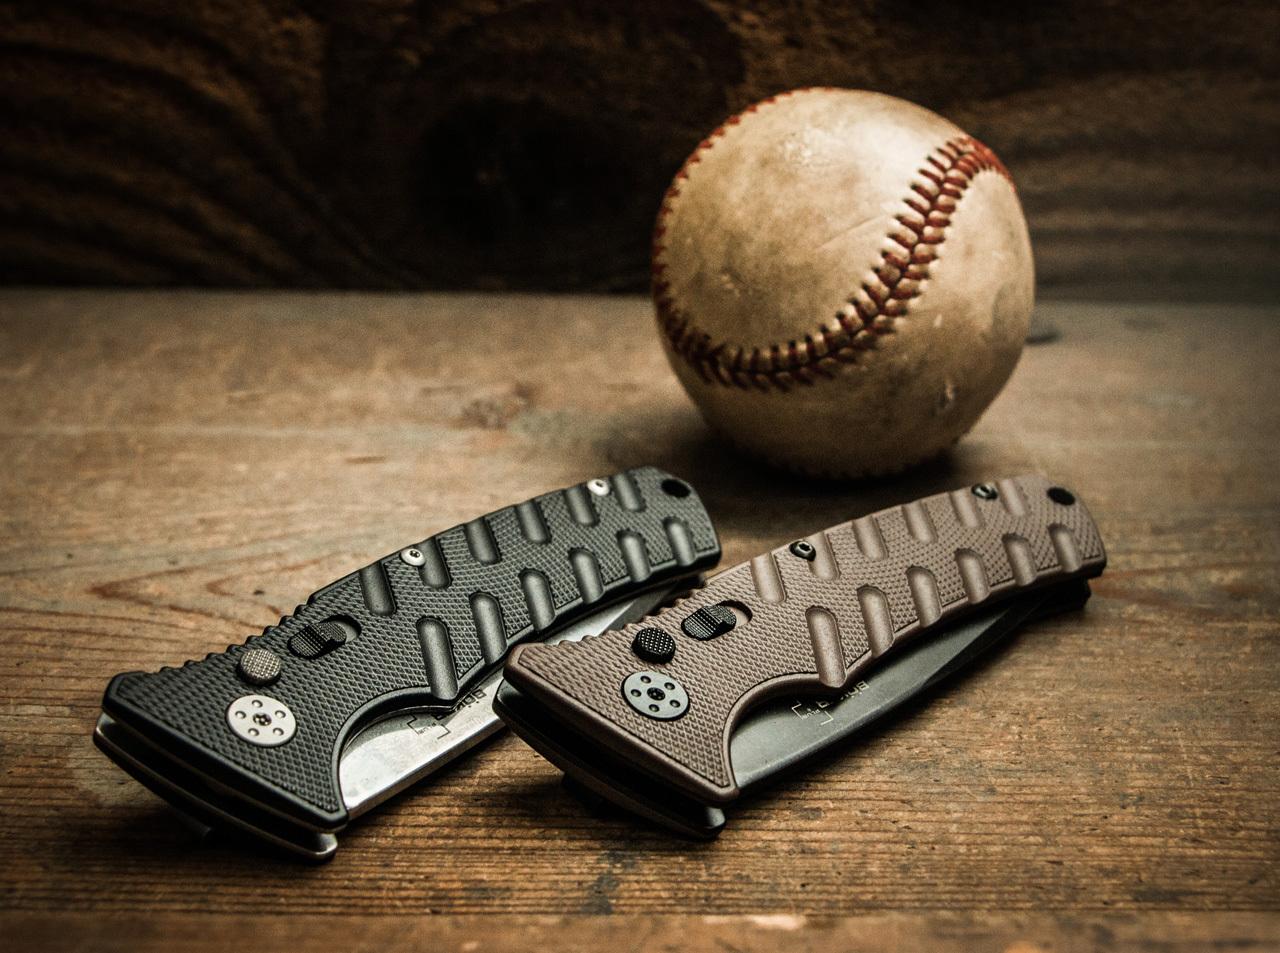 Фото 10 - Полуавтоматический складной нож Boker Plus Strike Coyote Spearpoint, сталь AUS-8 BlackWash™ Plain, рукоять анодированный алюминий, BK01BO424